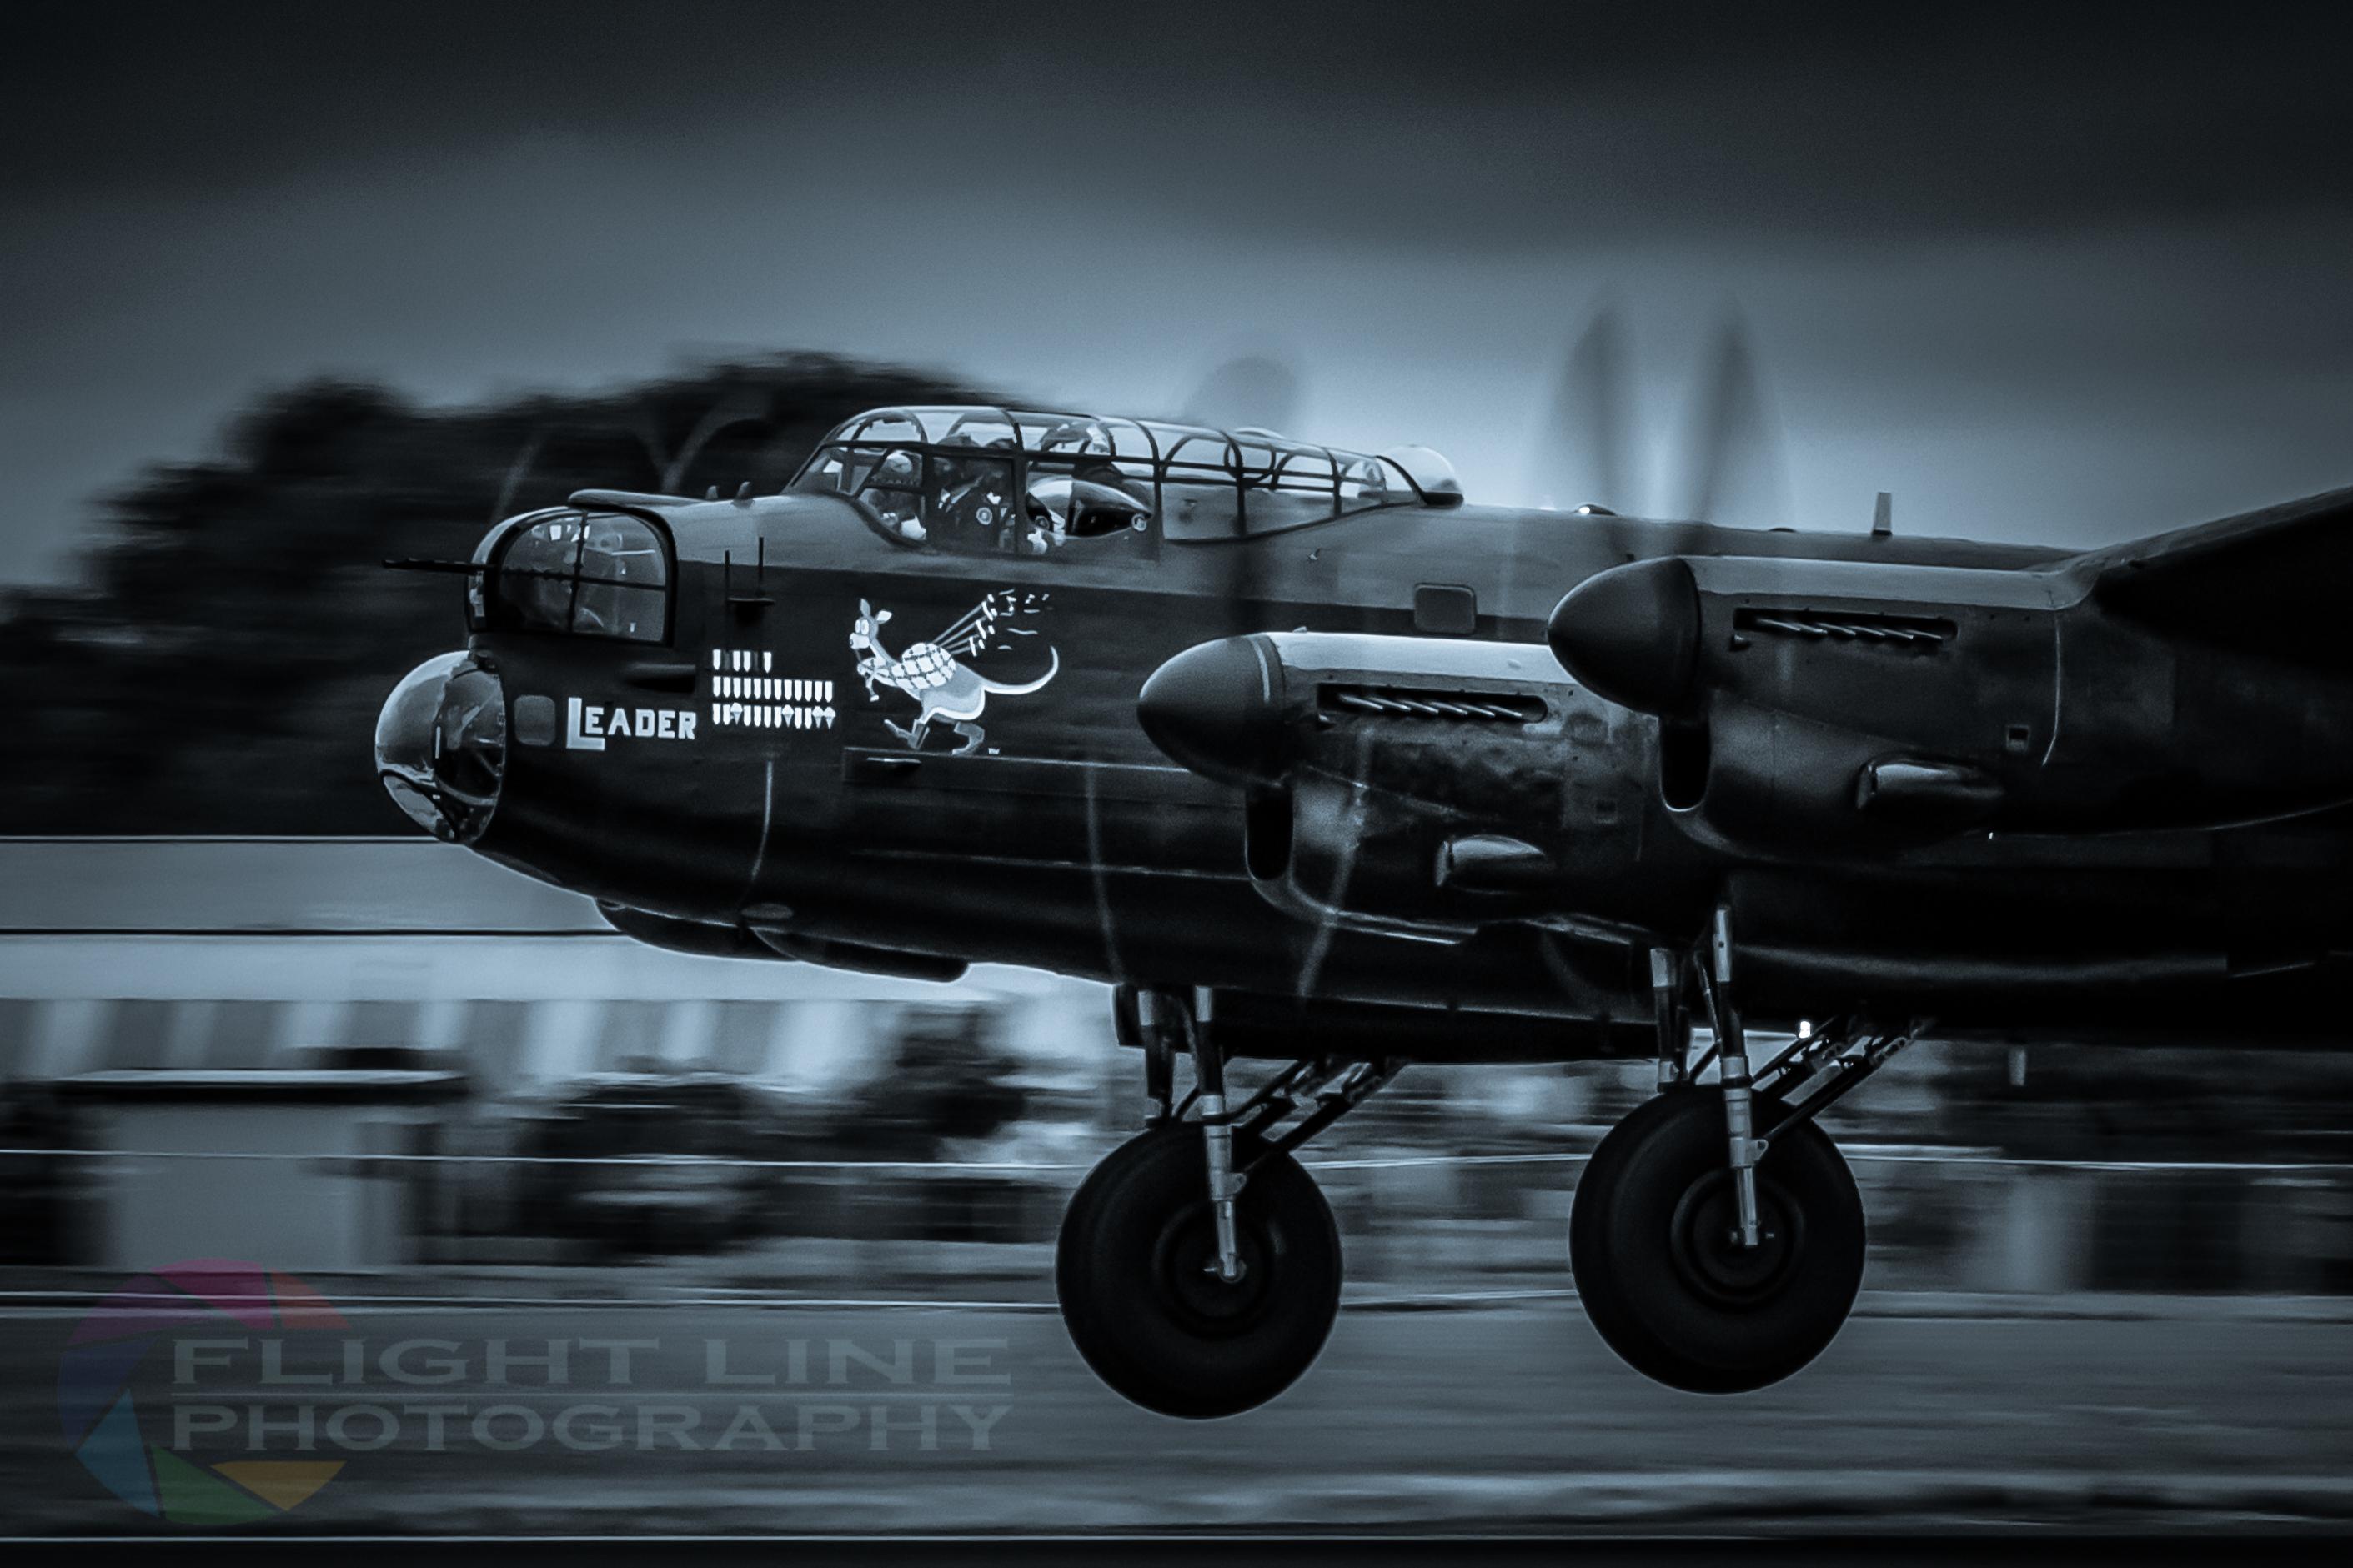 RAF BBMF Lancaster